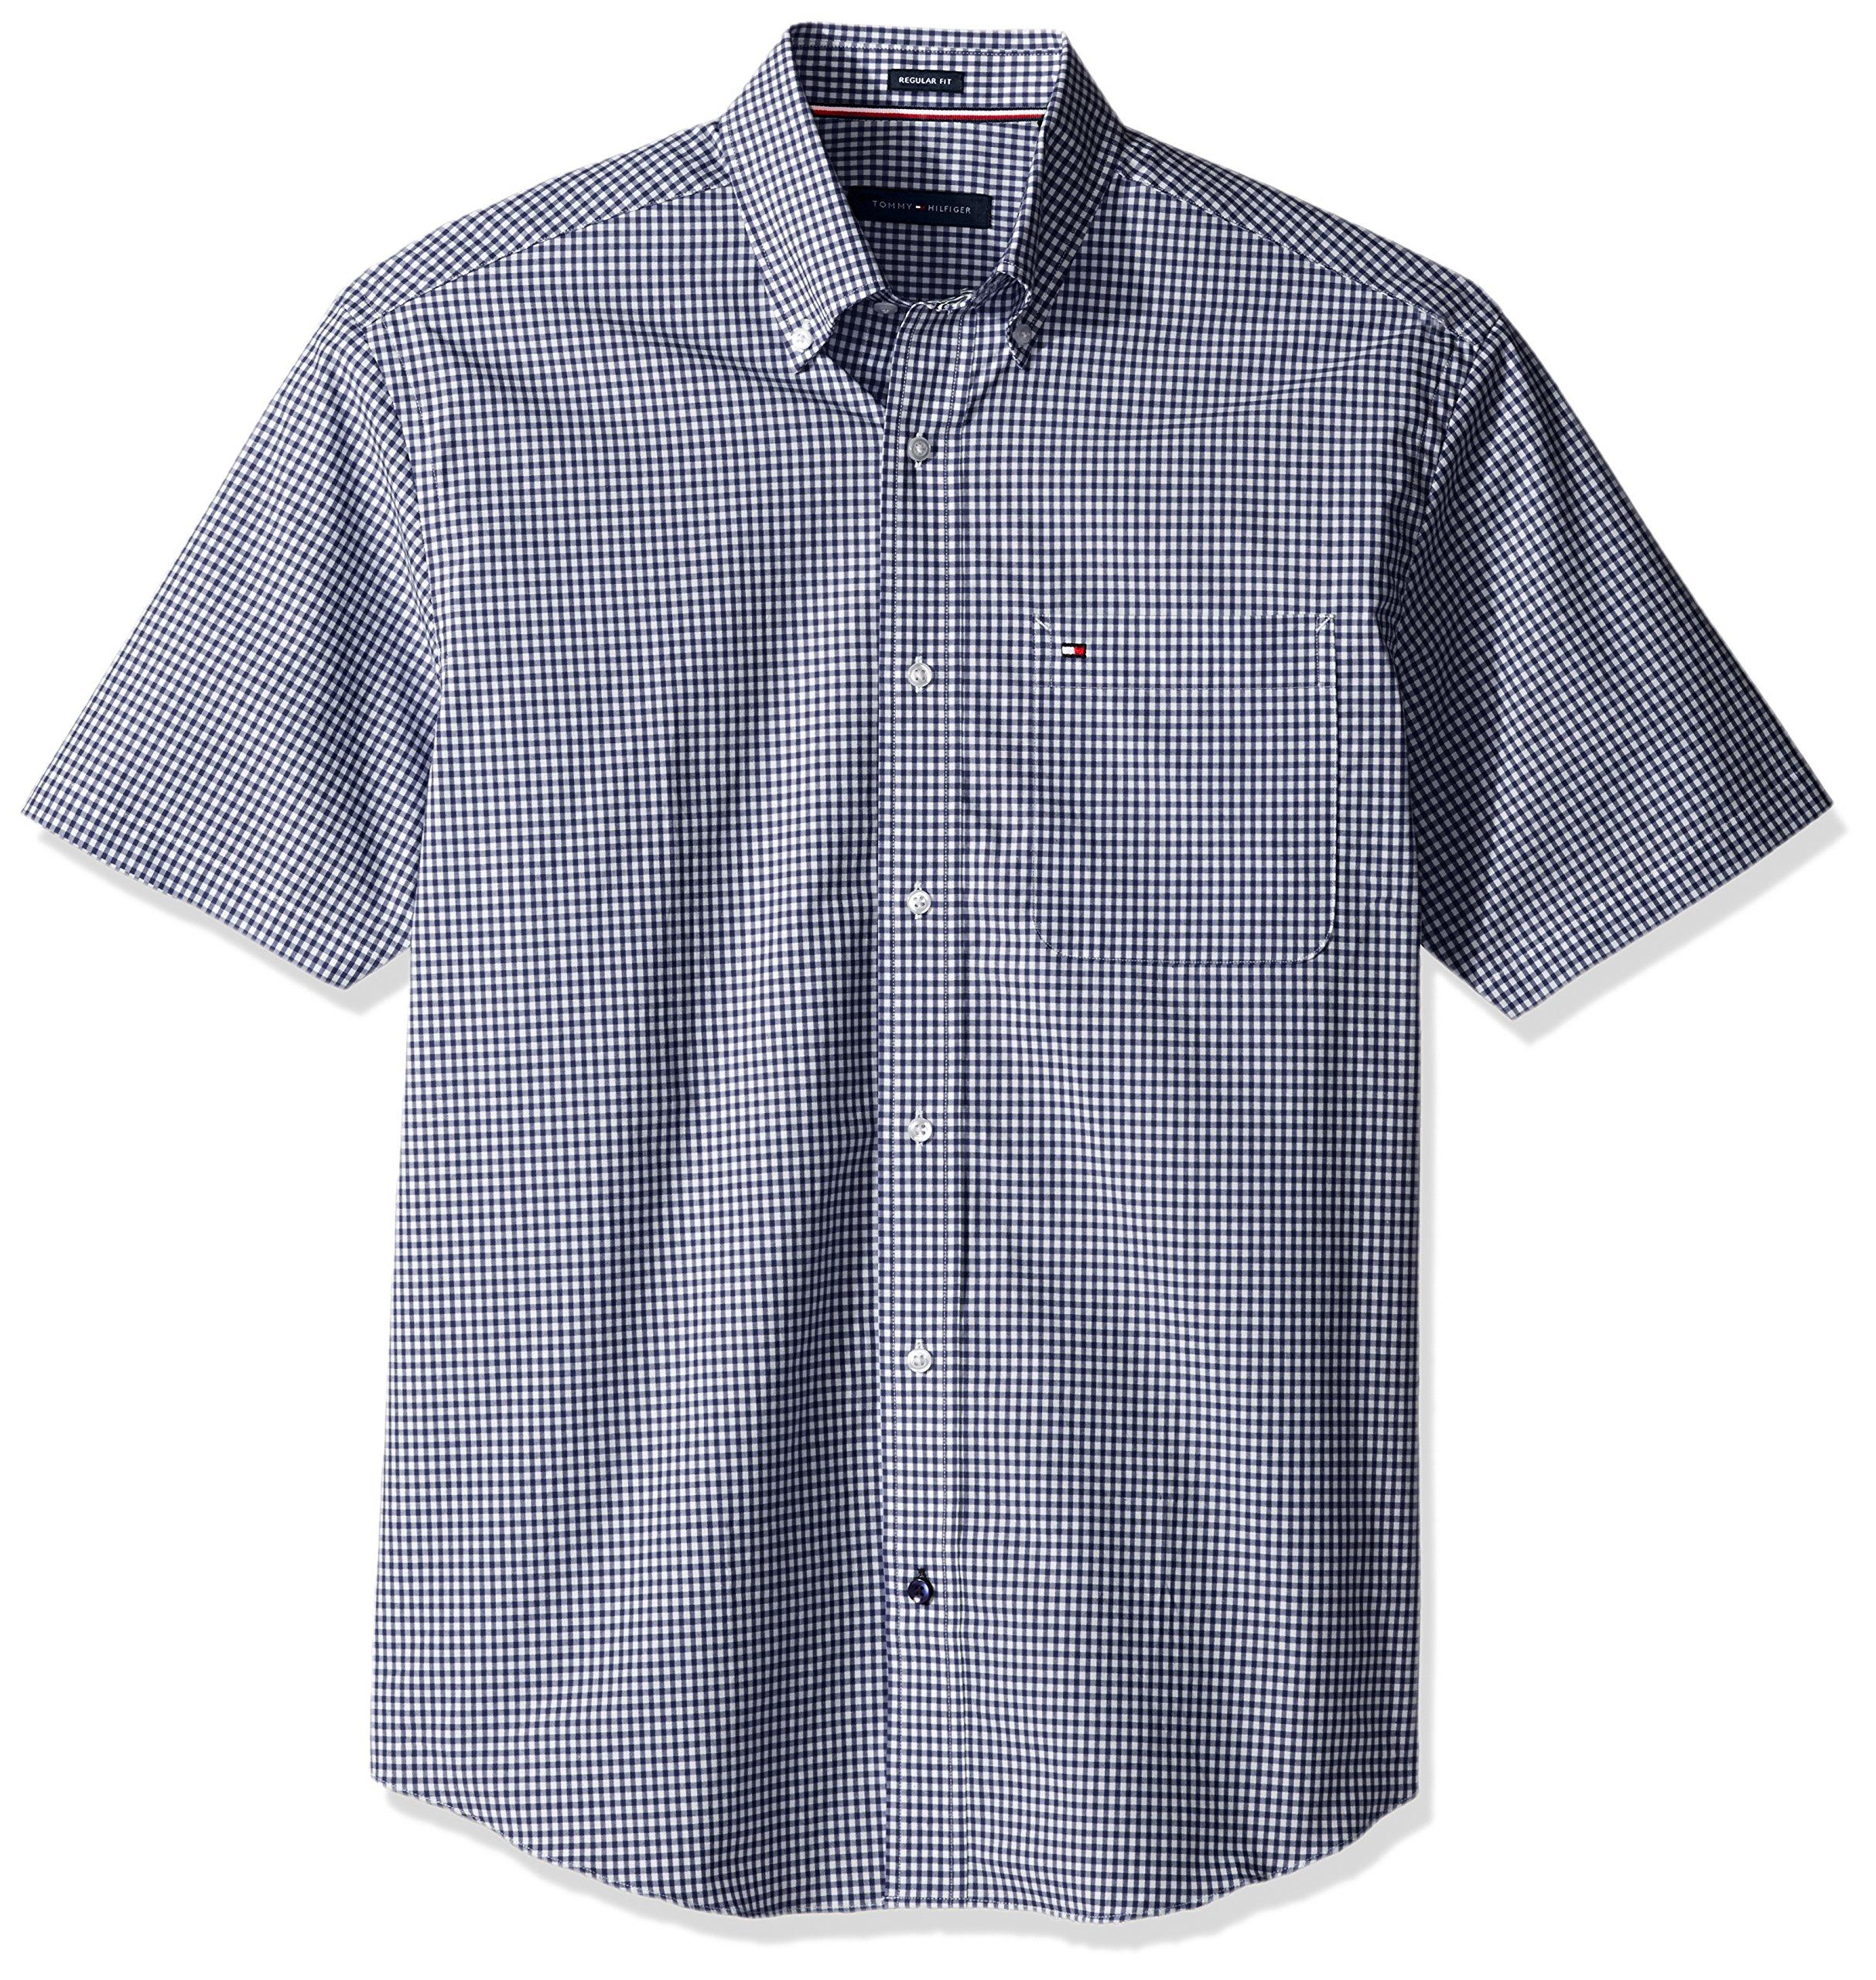 Tommy Hilfiger Men's Short Sleeve Button-Down Shirt, Riviera Blue, 16.5'' Neck